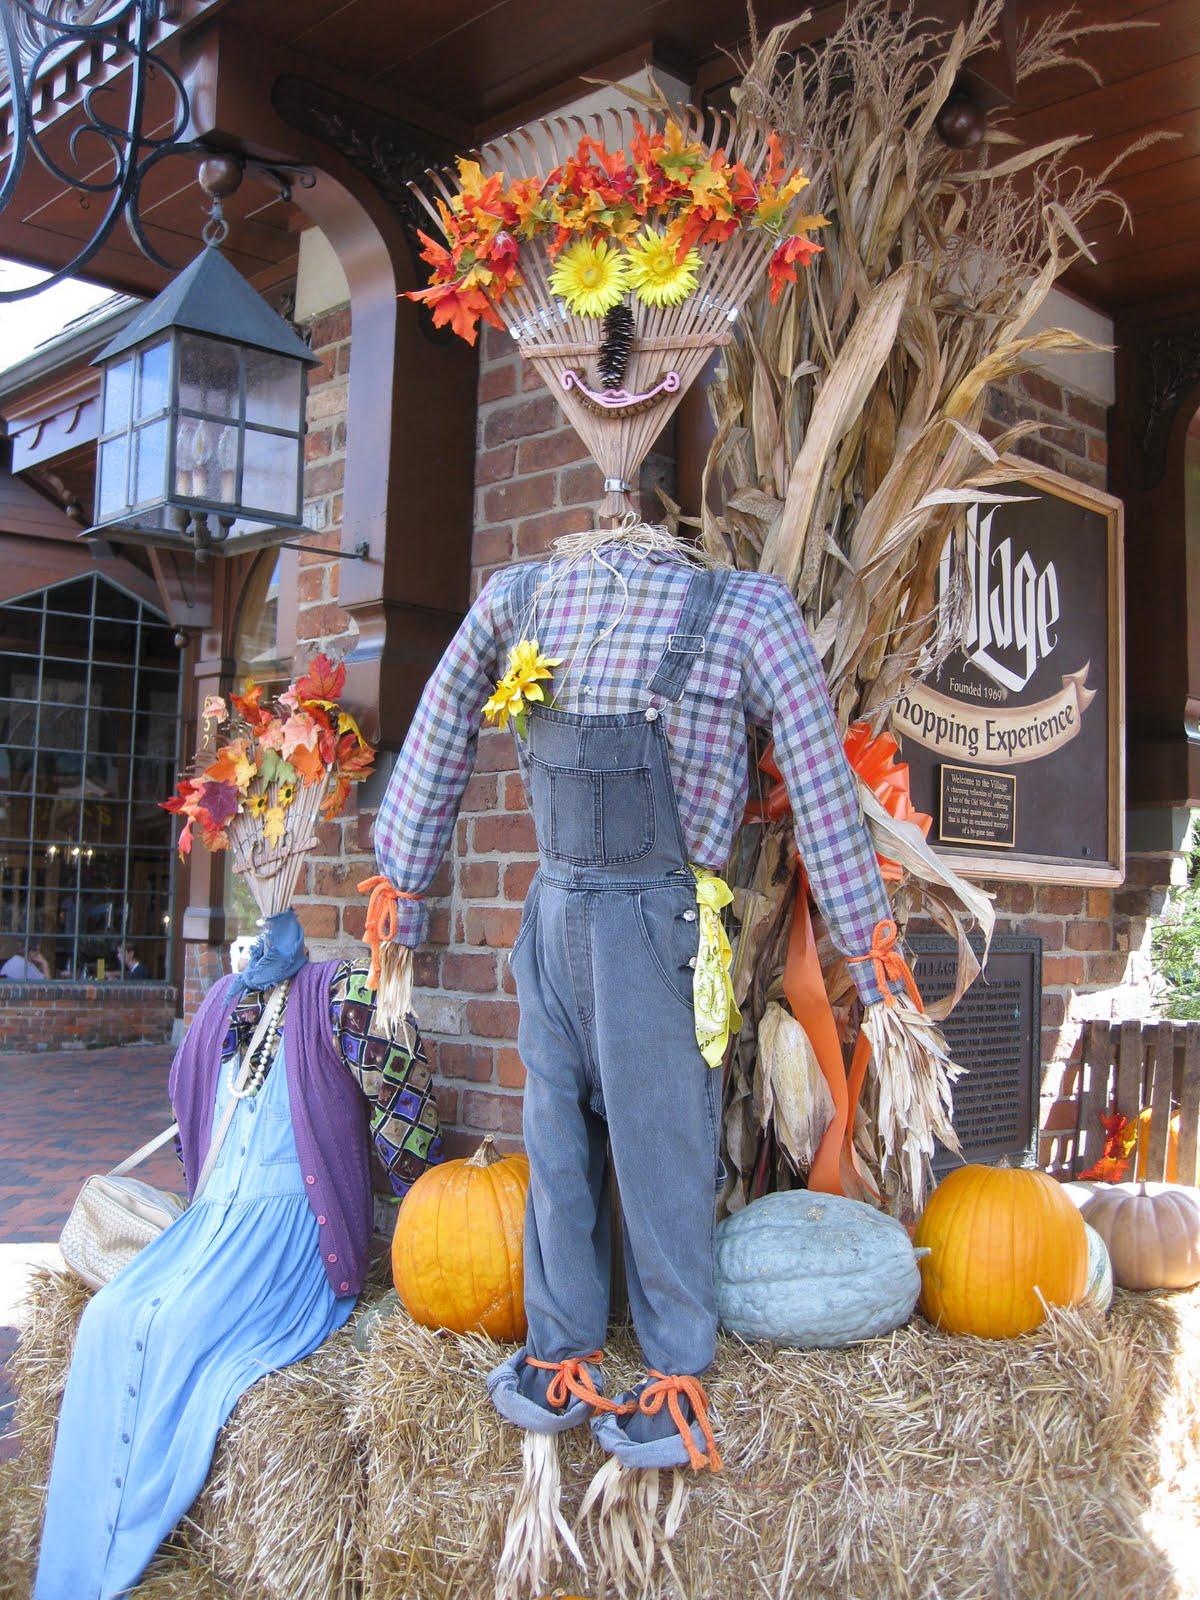 Ramblings Of A Southern Girl Whimsical Fall Displays